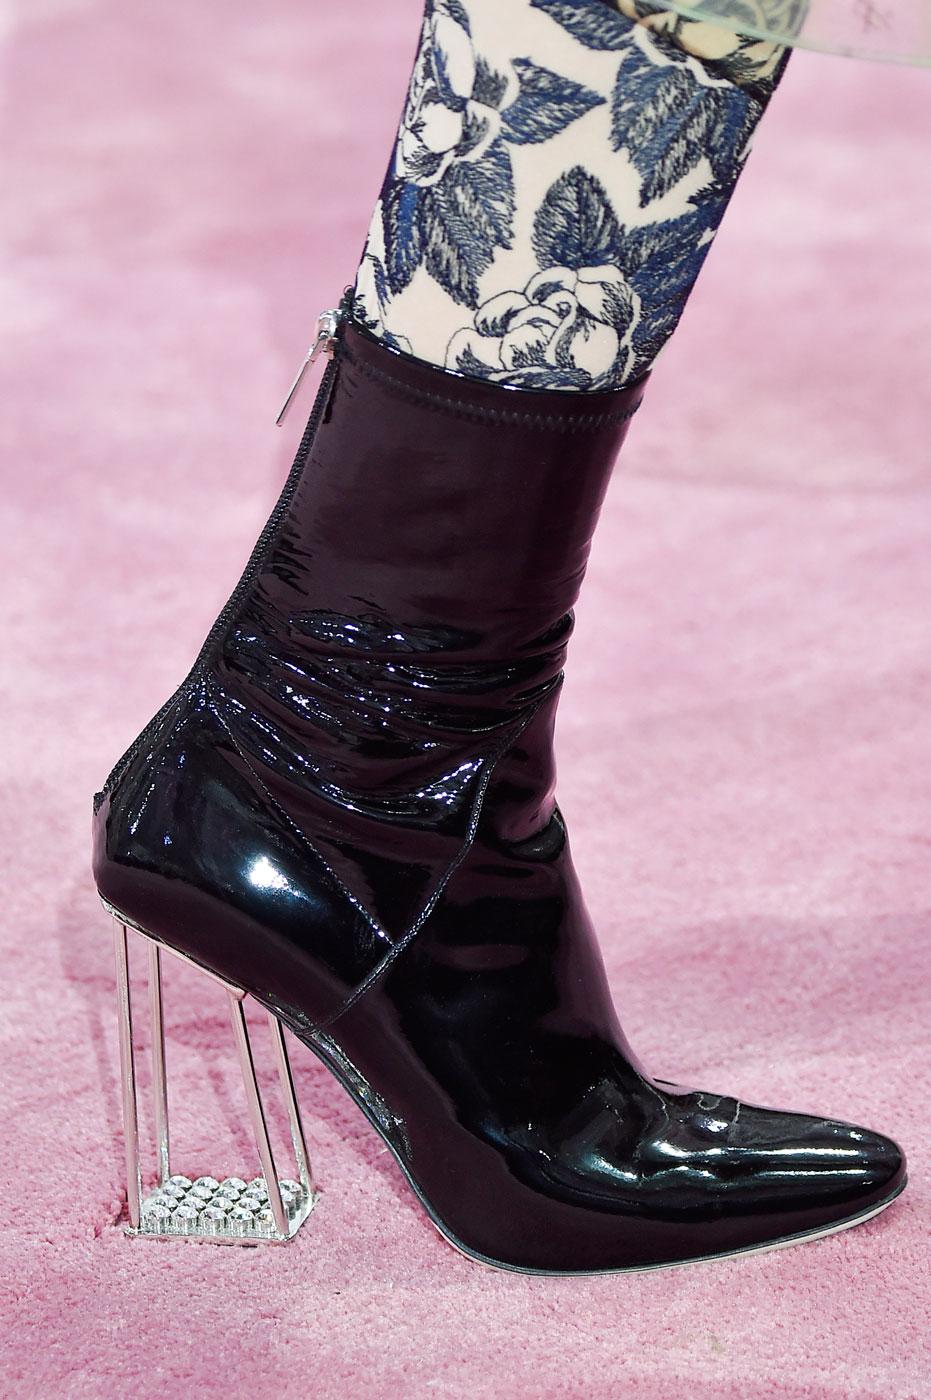 Christian-Dior-fashion-runway-show-close-ups-haute-couture-paris-spring-summer-2015-the-impression-077